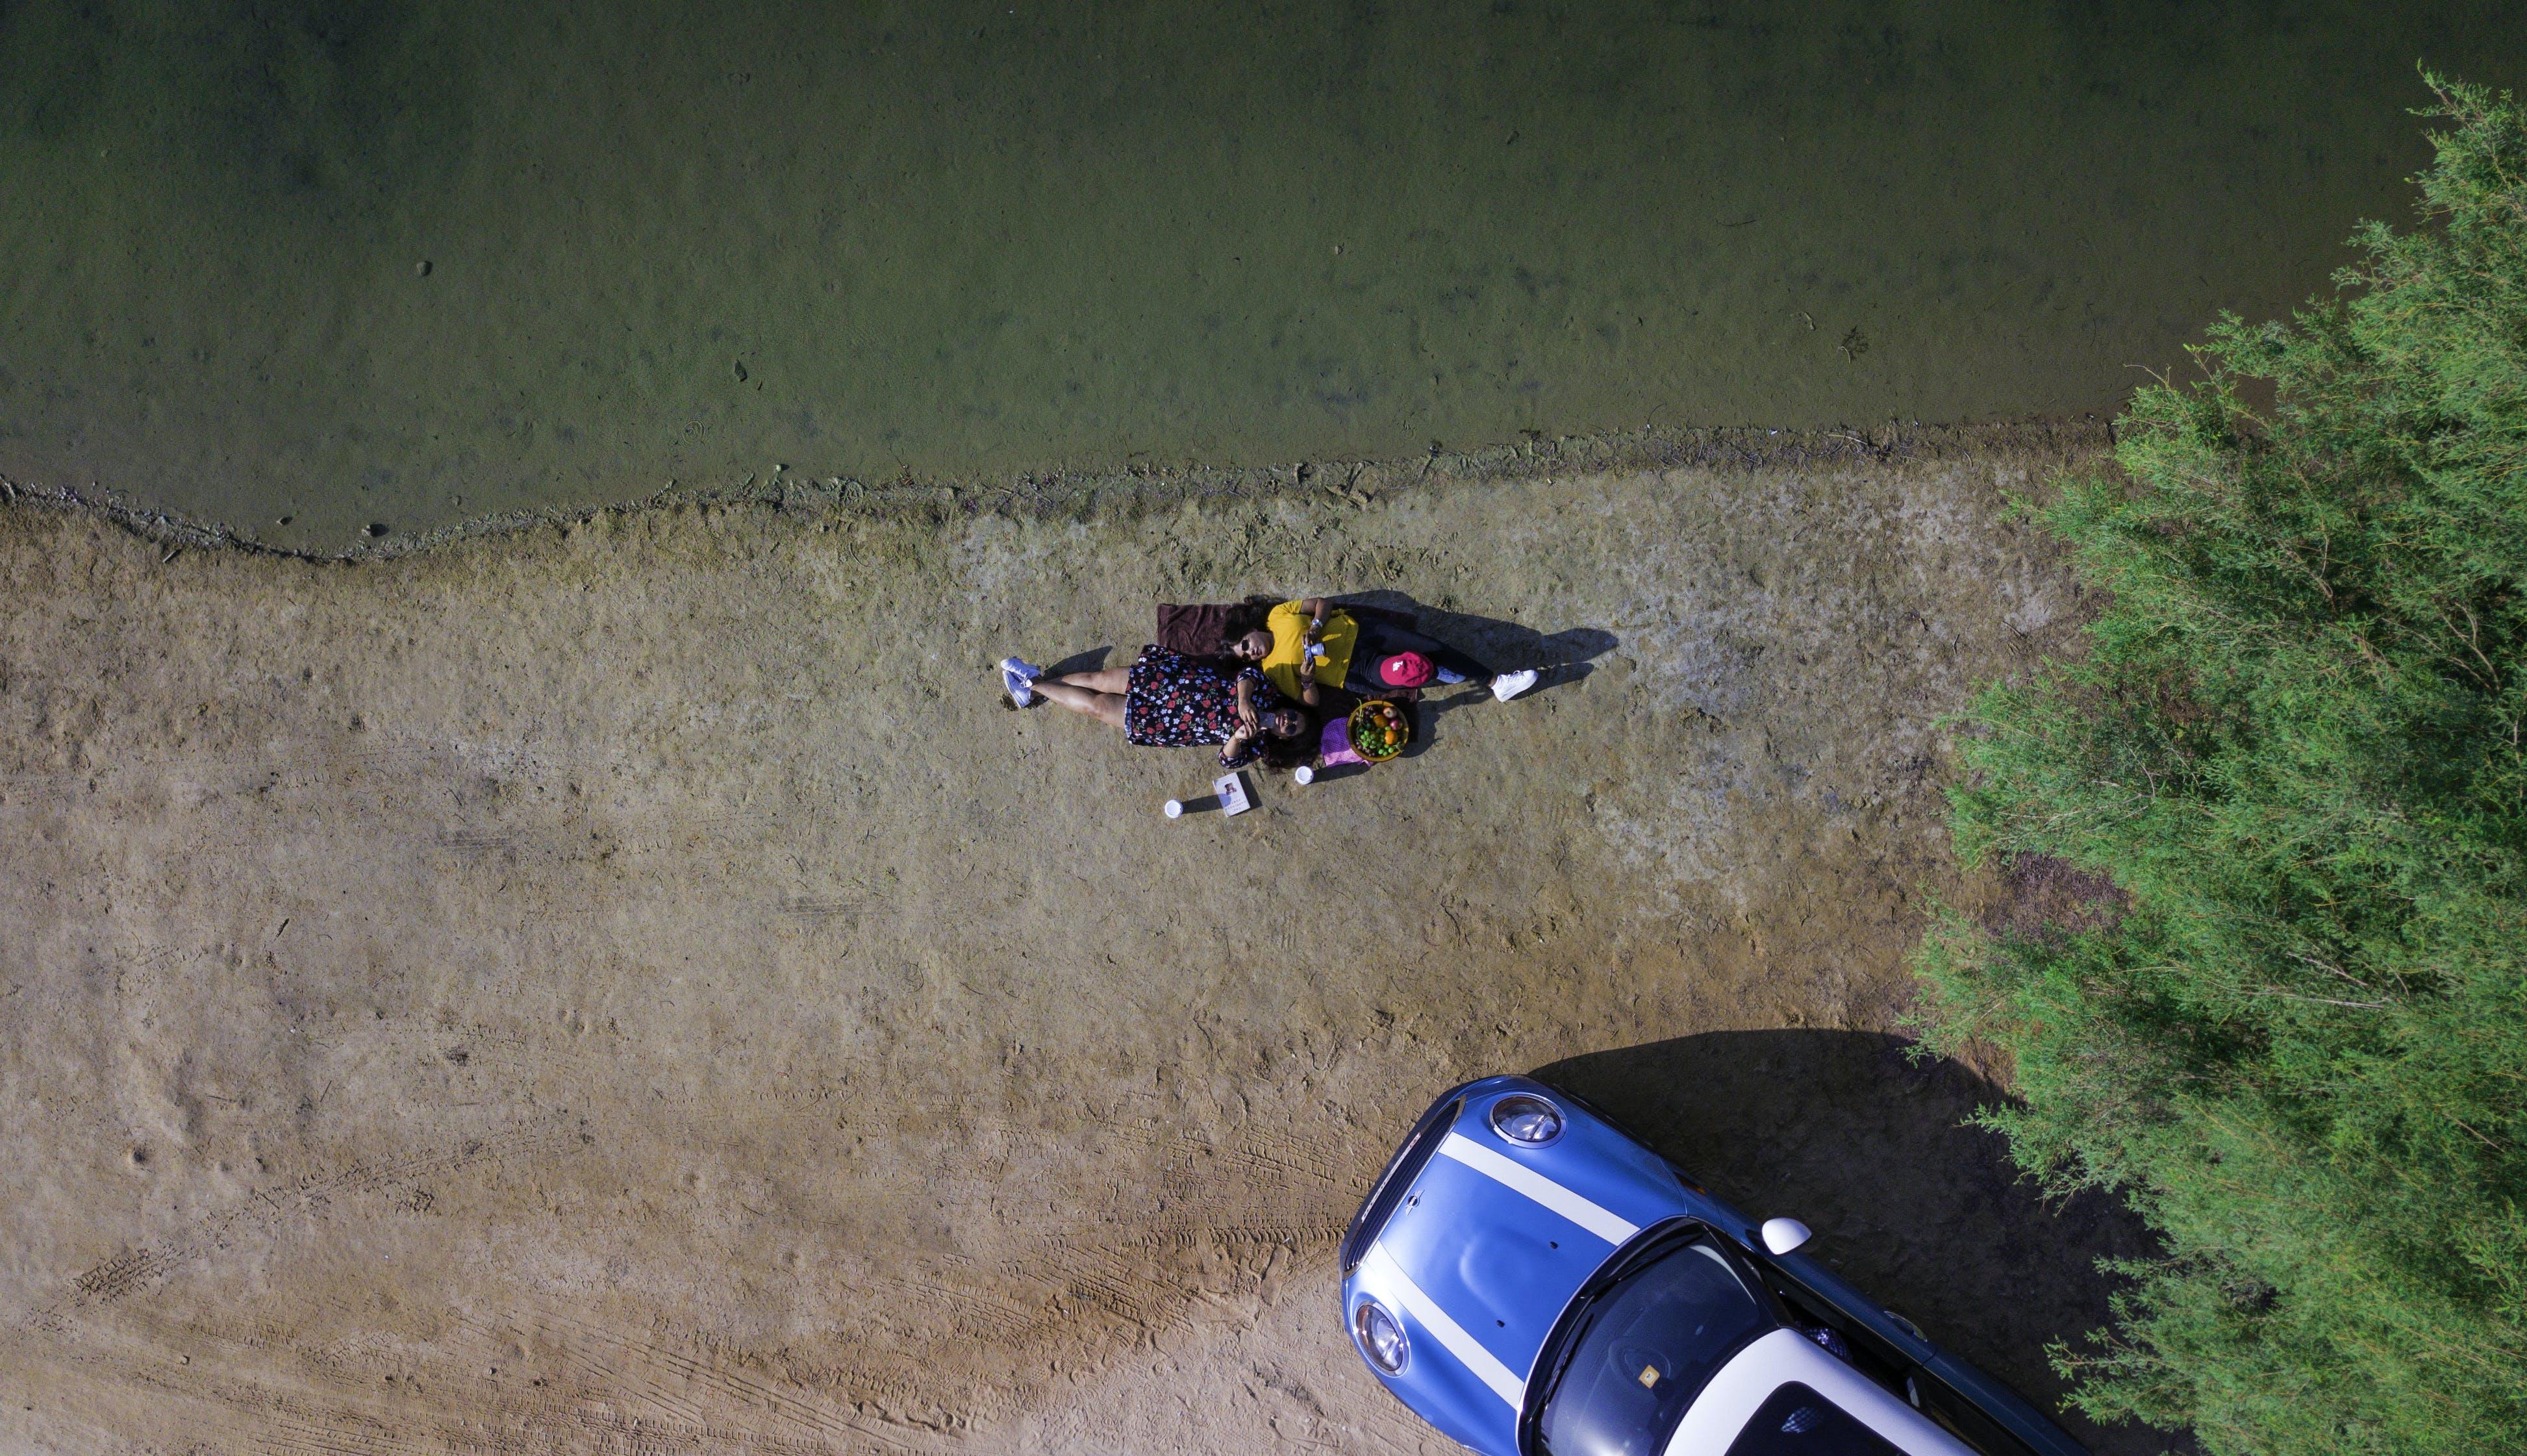 Aerial Photo of Women Lying on Ground